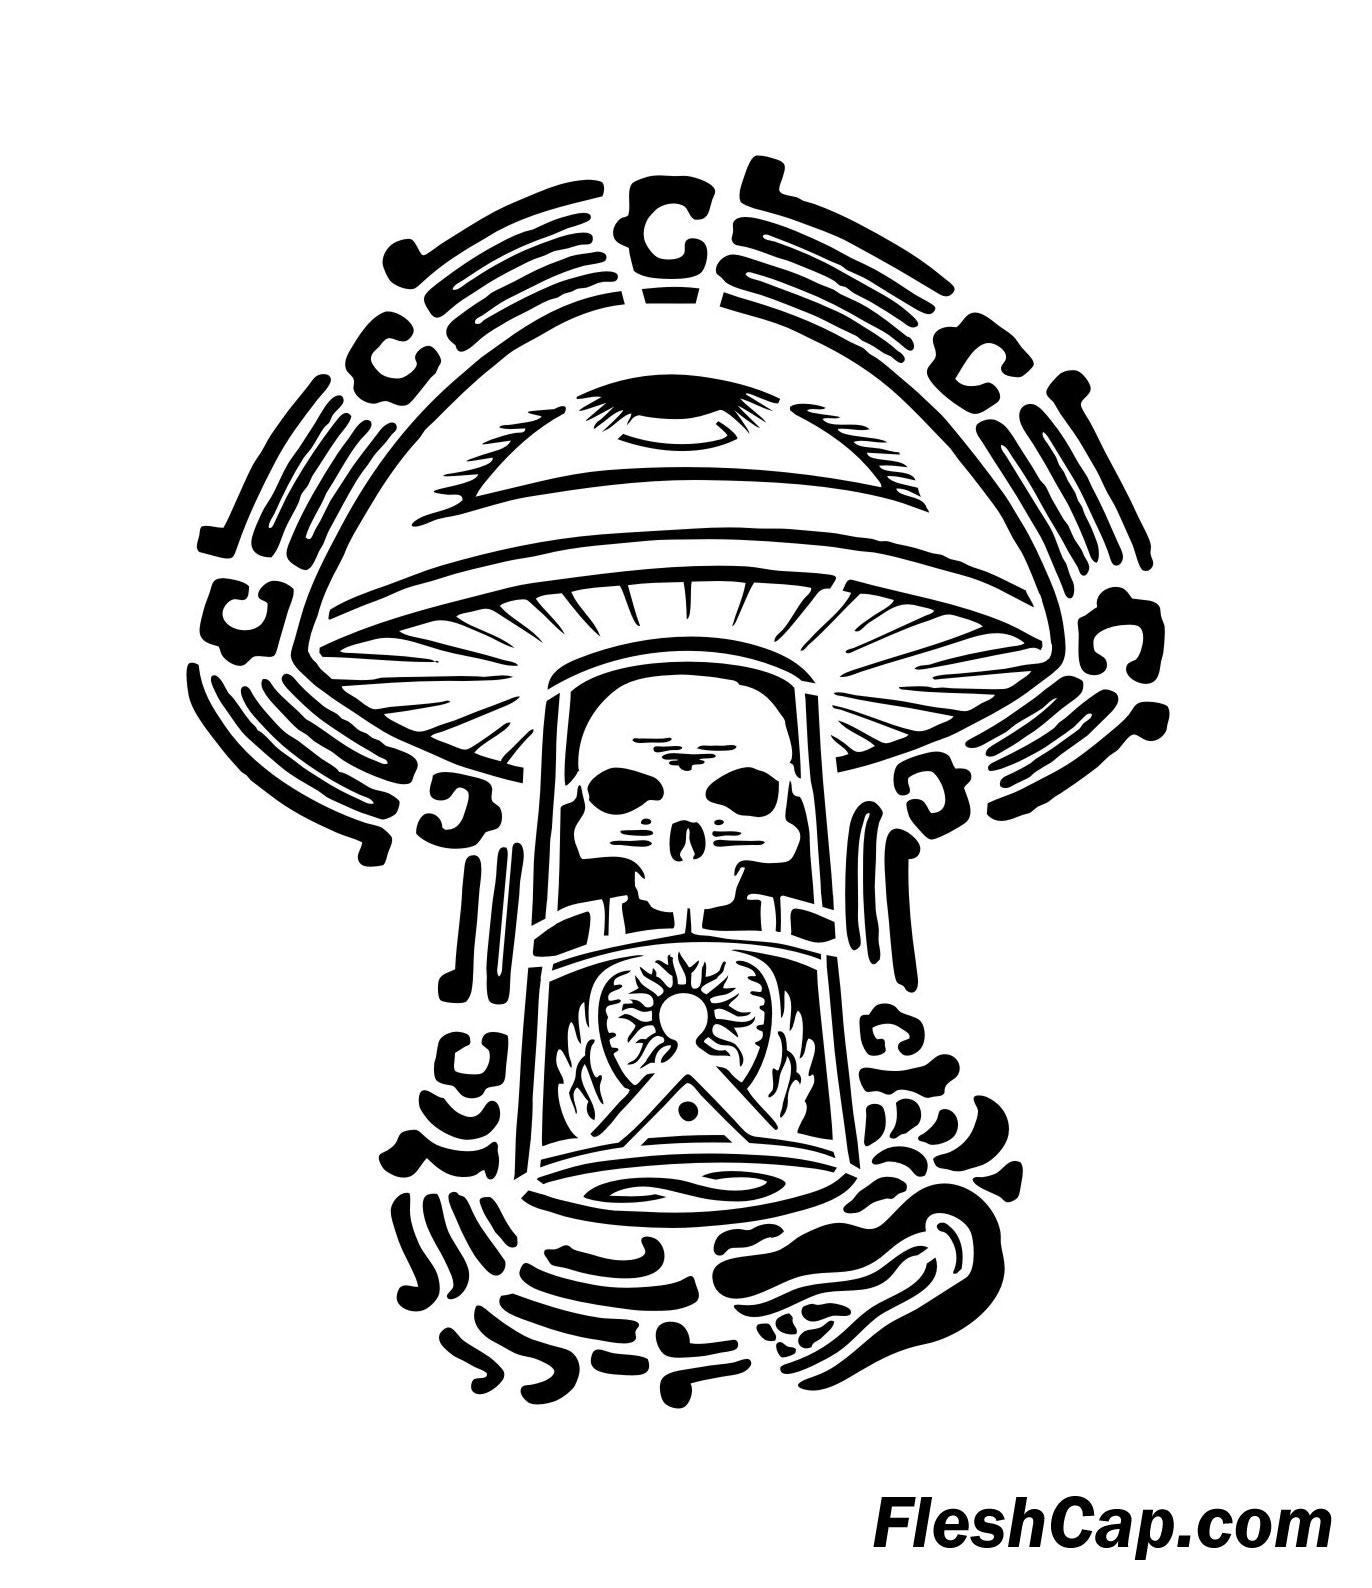 1372x1588 Graffiti Mushroom Drawings How To Draw Shrooms, Shrooms, Step By